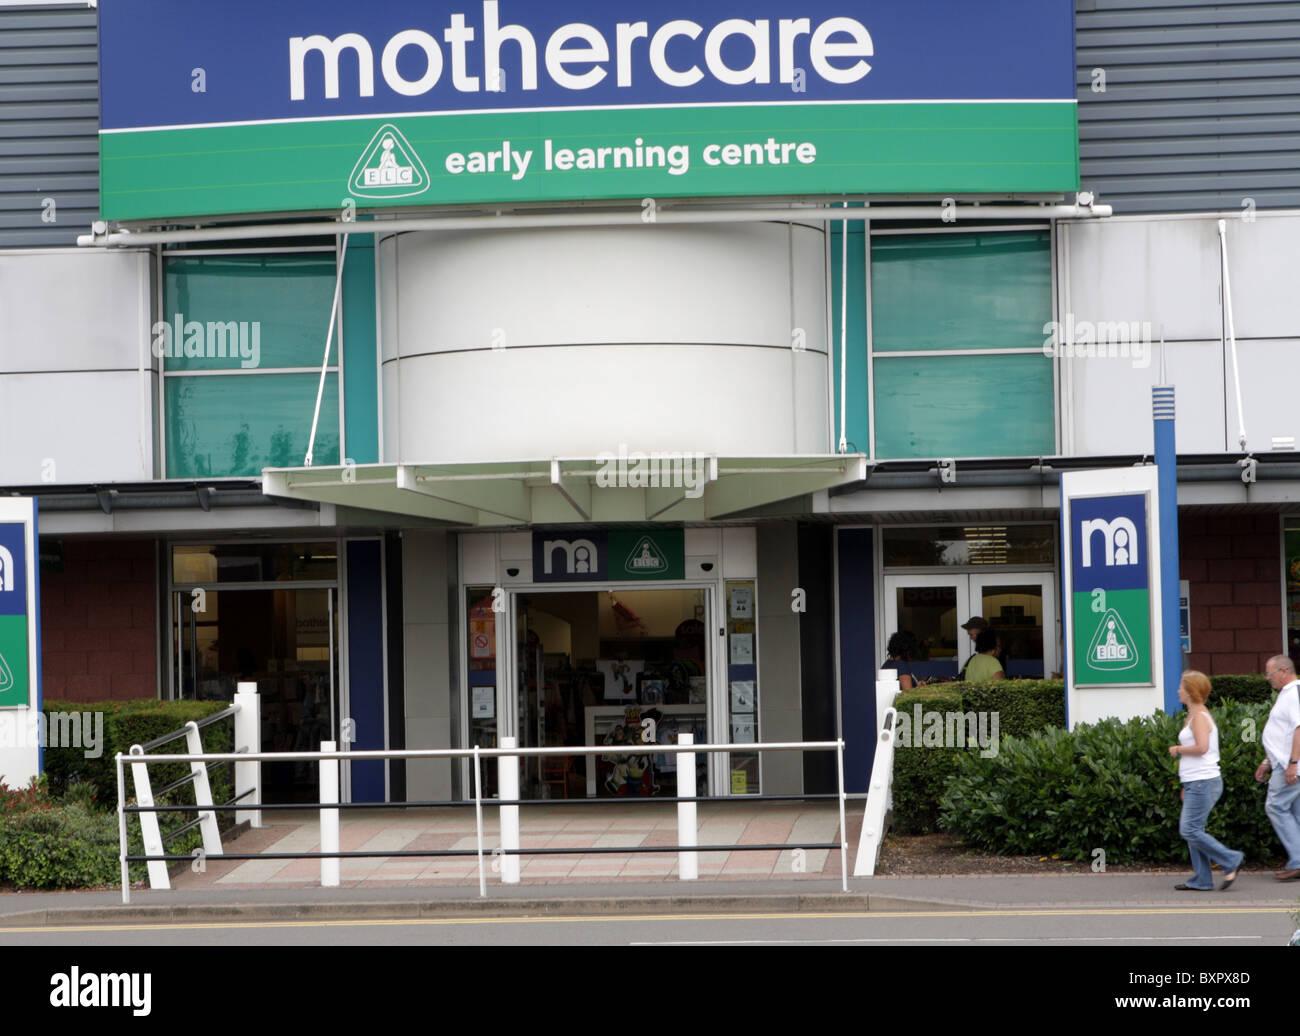 Mothercare shop, Birmingham UK 2010 - Stock Image